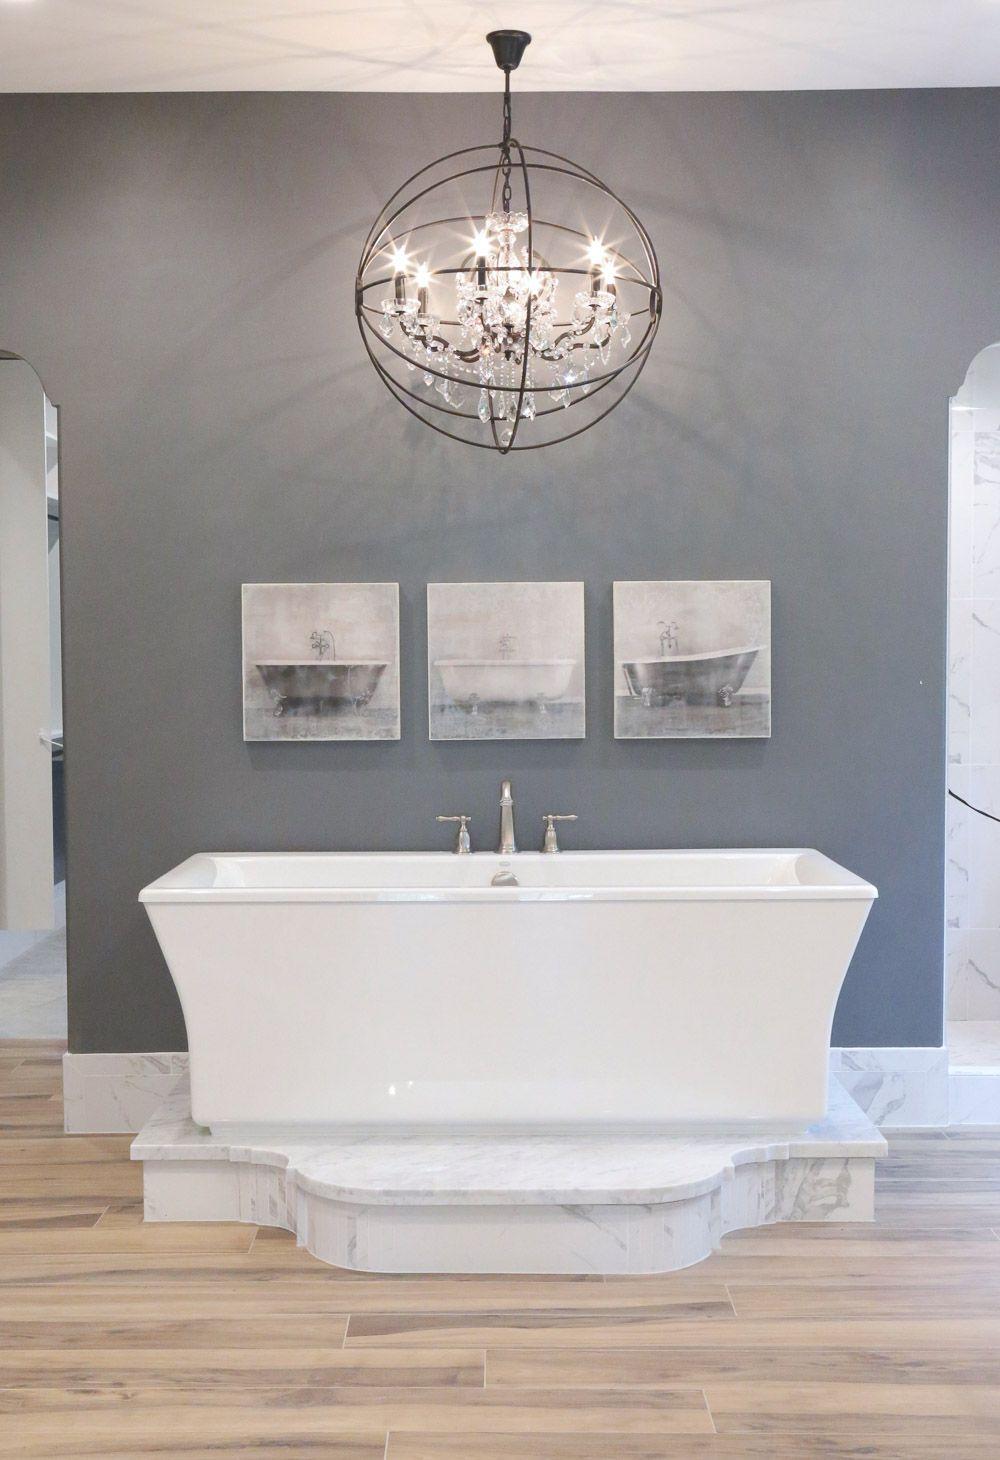 Benjamin Moore Trout Gray: Color Spotlight   Bedroom paint ...